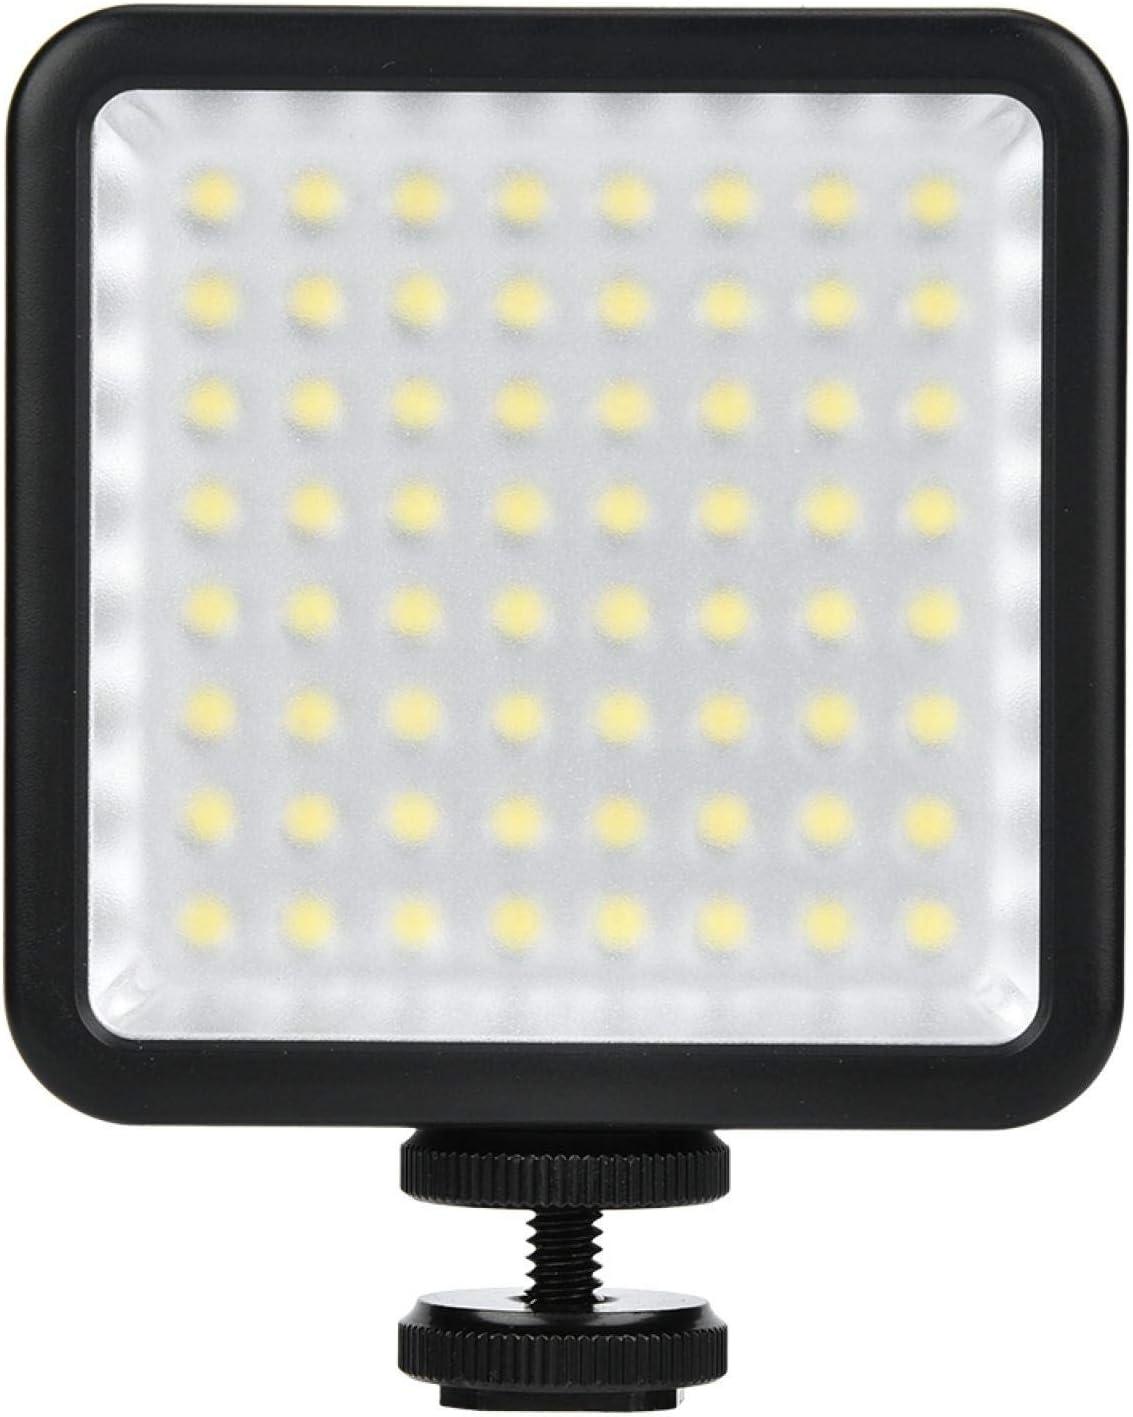 SALALIS High Brightness LED Photography Video Light Max 55% OFF